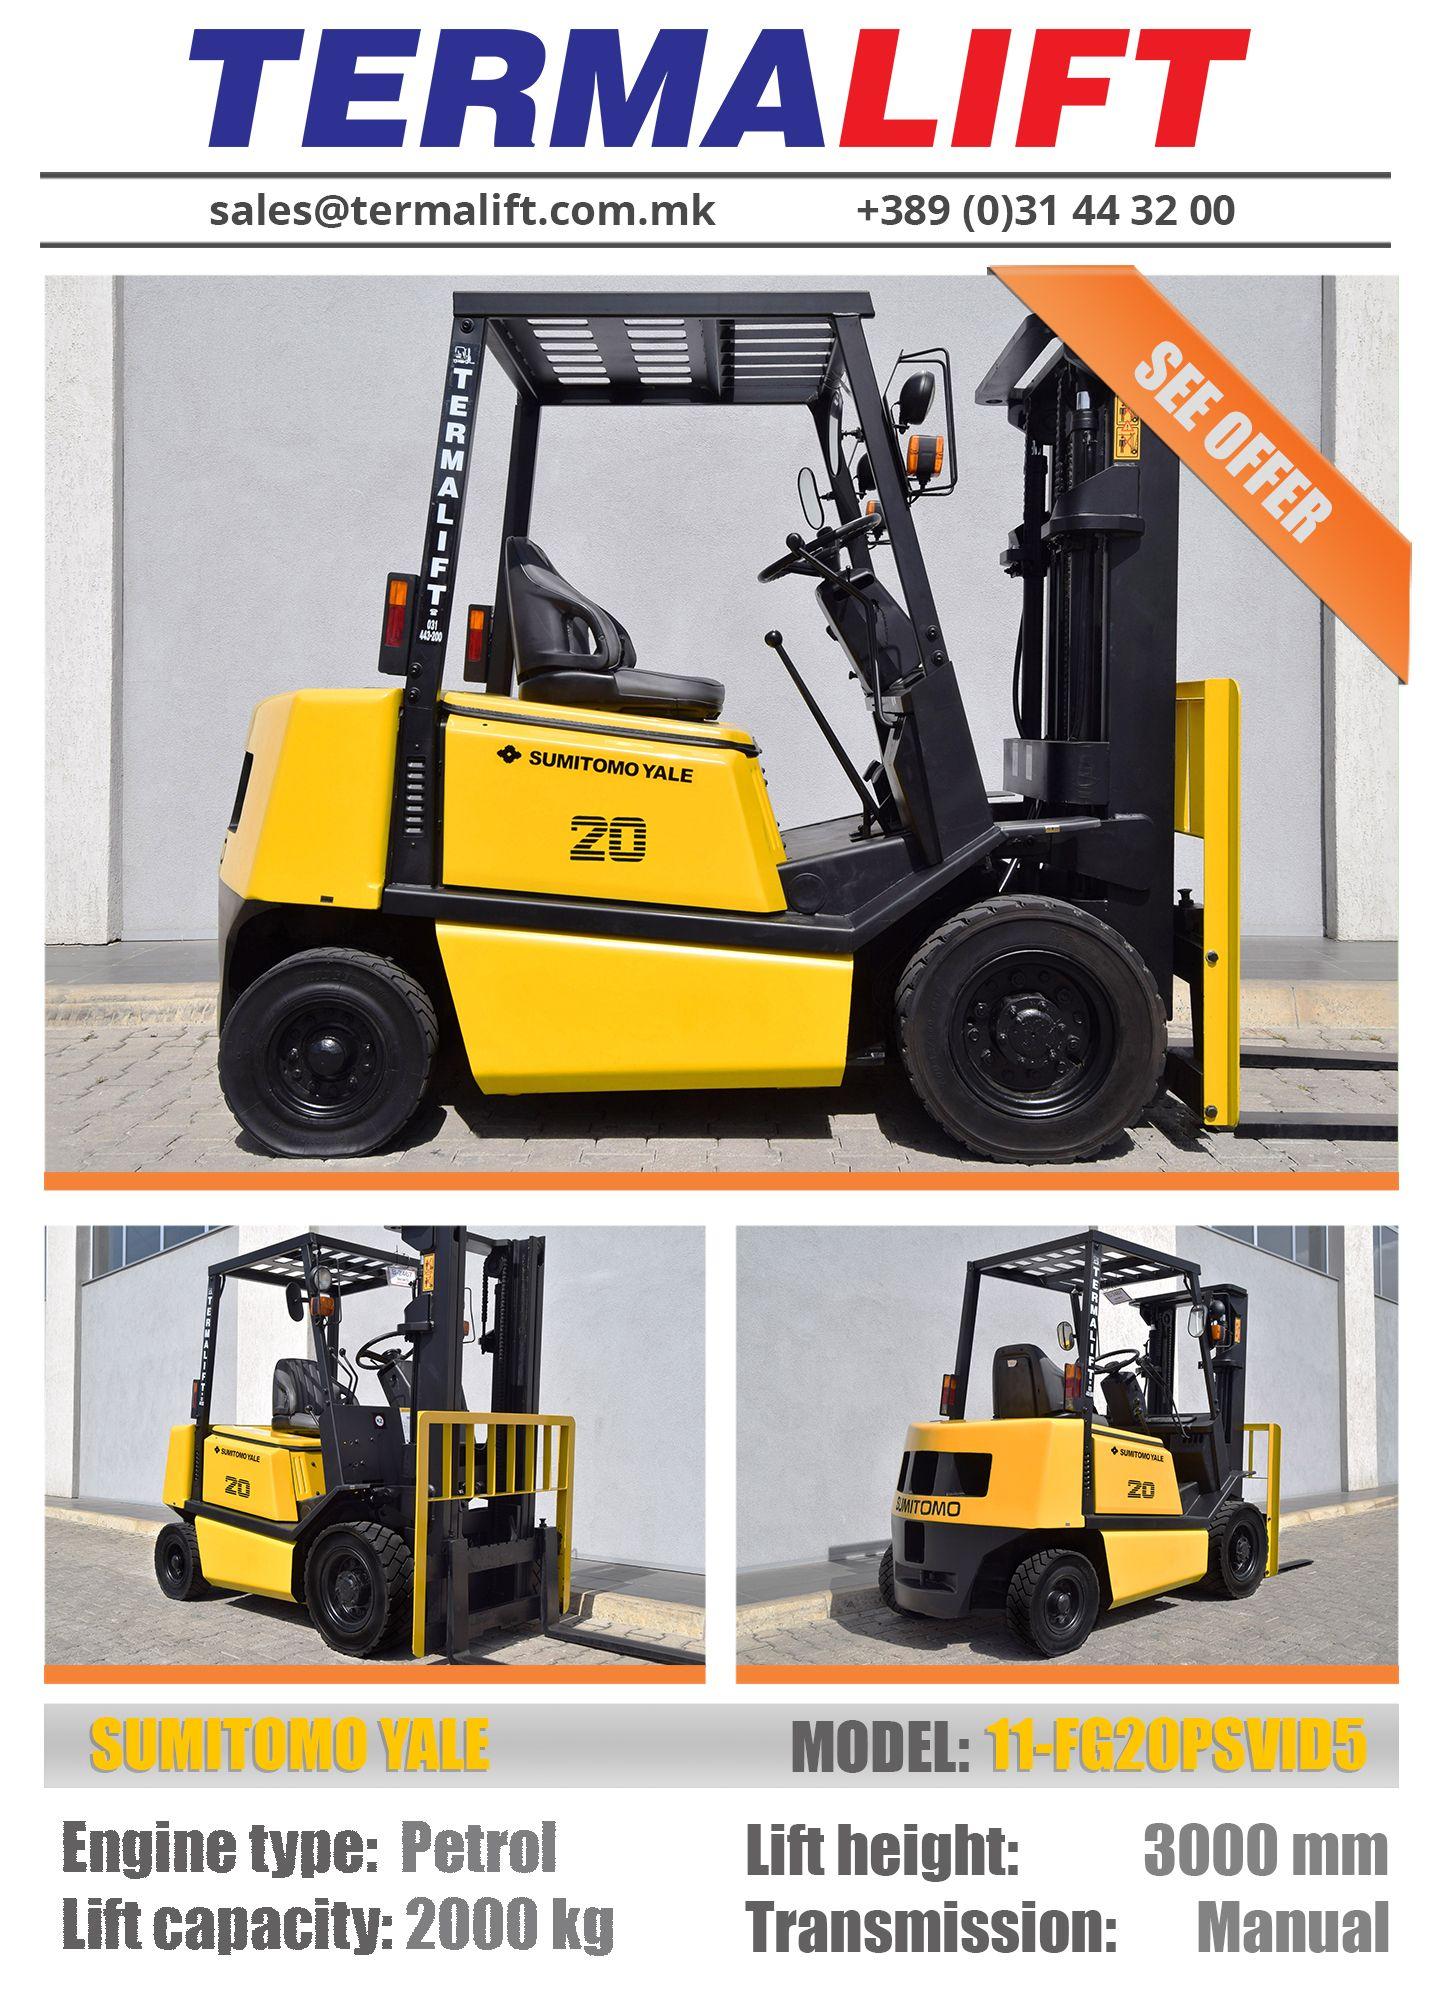 YALE | Forklift | Model: 11-FG20PSVID5 | Engine type: Petrol | Lift  capacity: 2000 kg | Lift height: 3000 mm | Transmission: Manual | #forklift  #yale ...